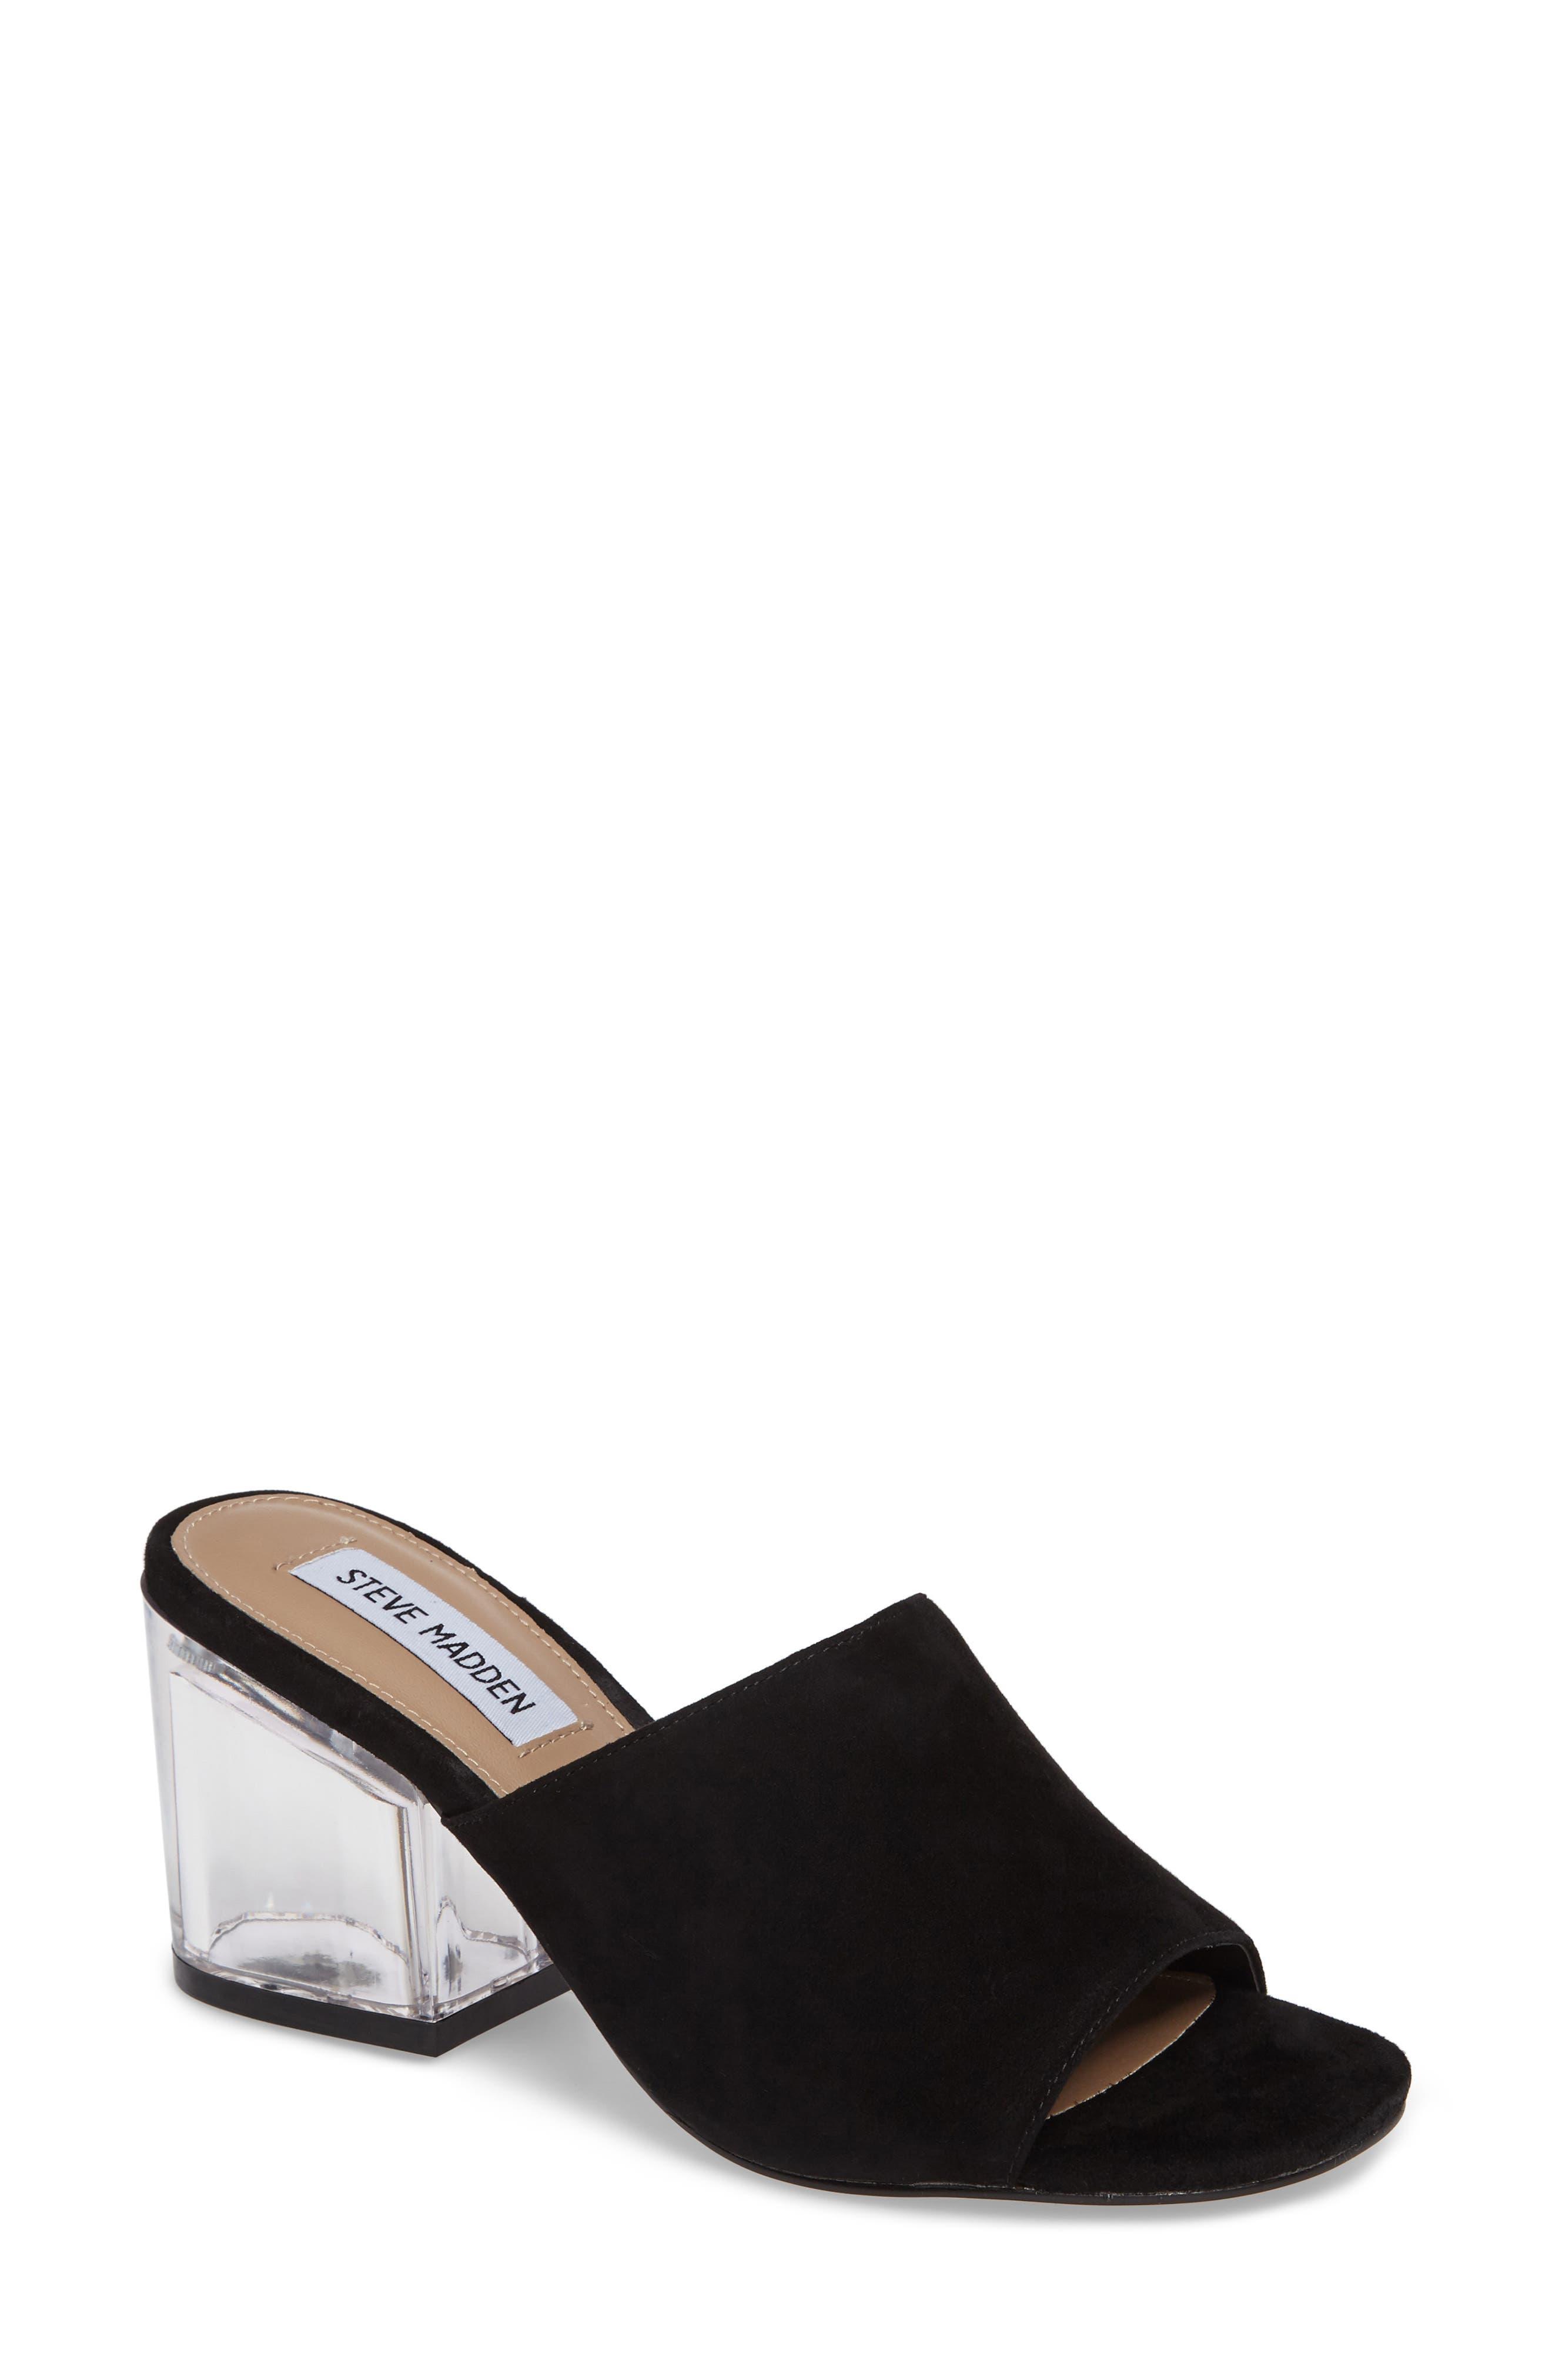 Dalis Clear Heel Slide Sandal,                         Main,                         color, 006